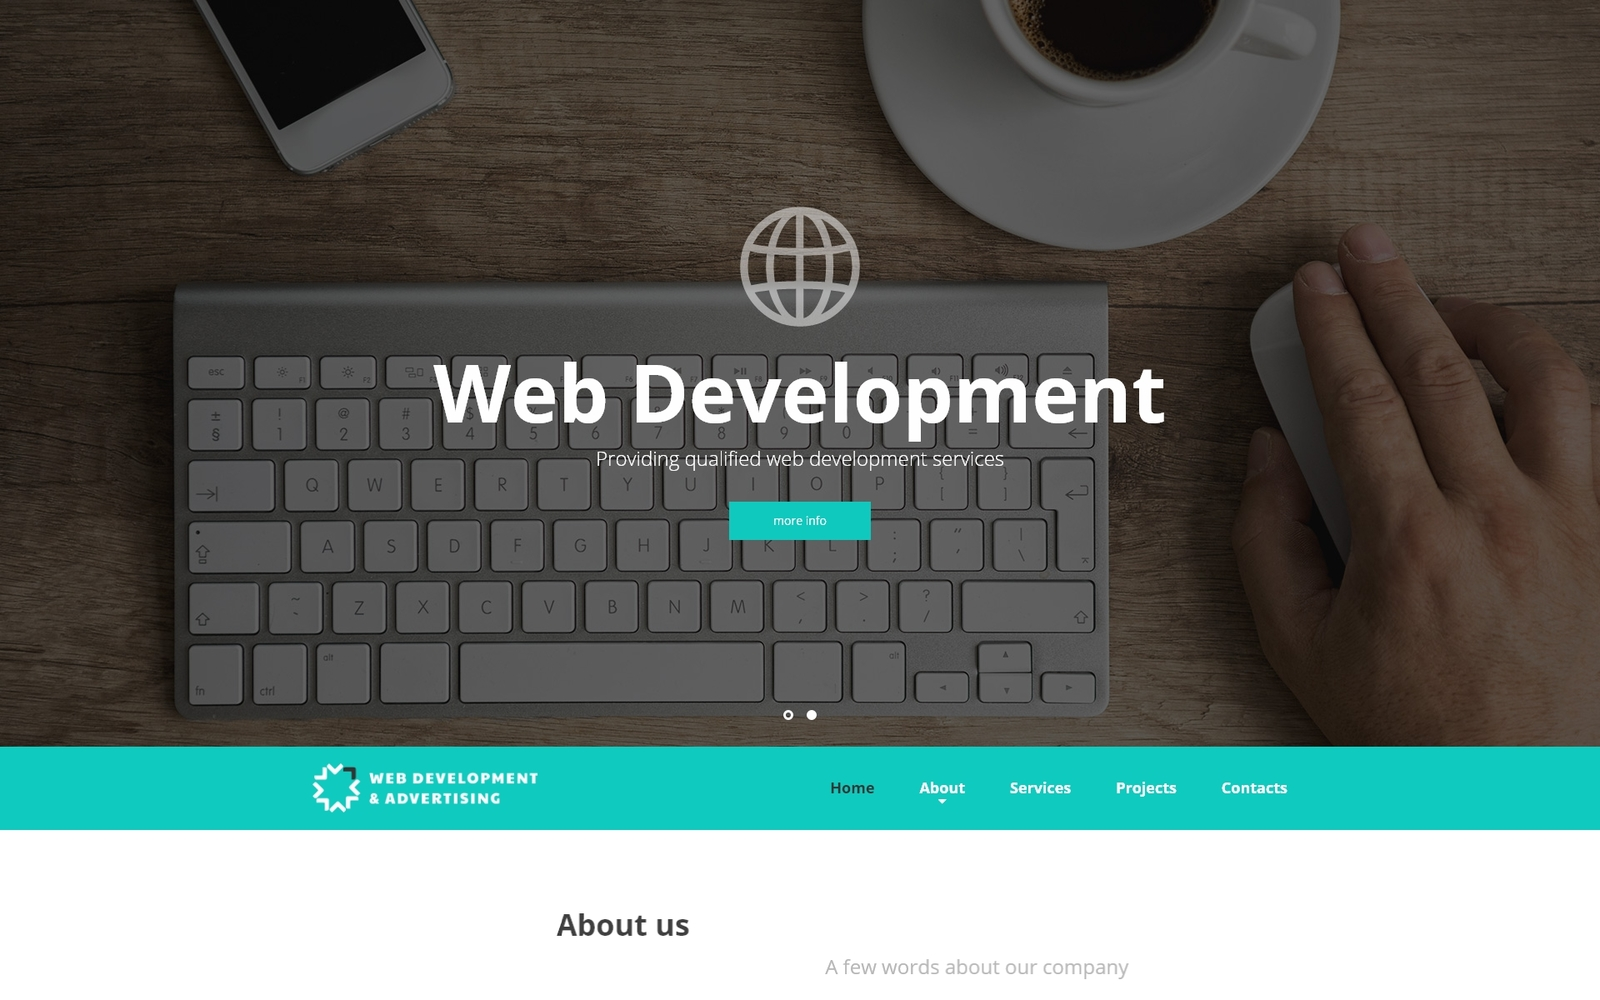 "Template Siti Web Responsive #52537 ""Web Development & Advertising - Web Development Responsive"""